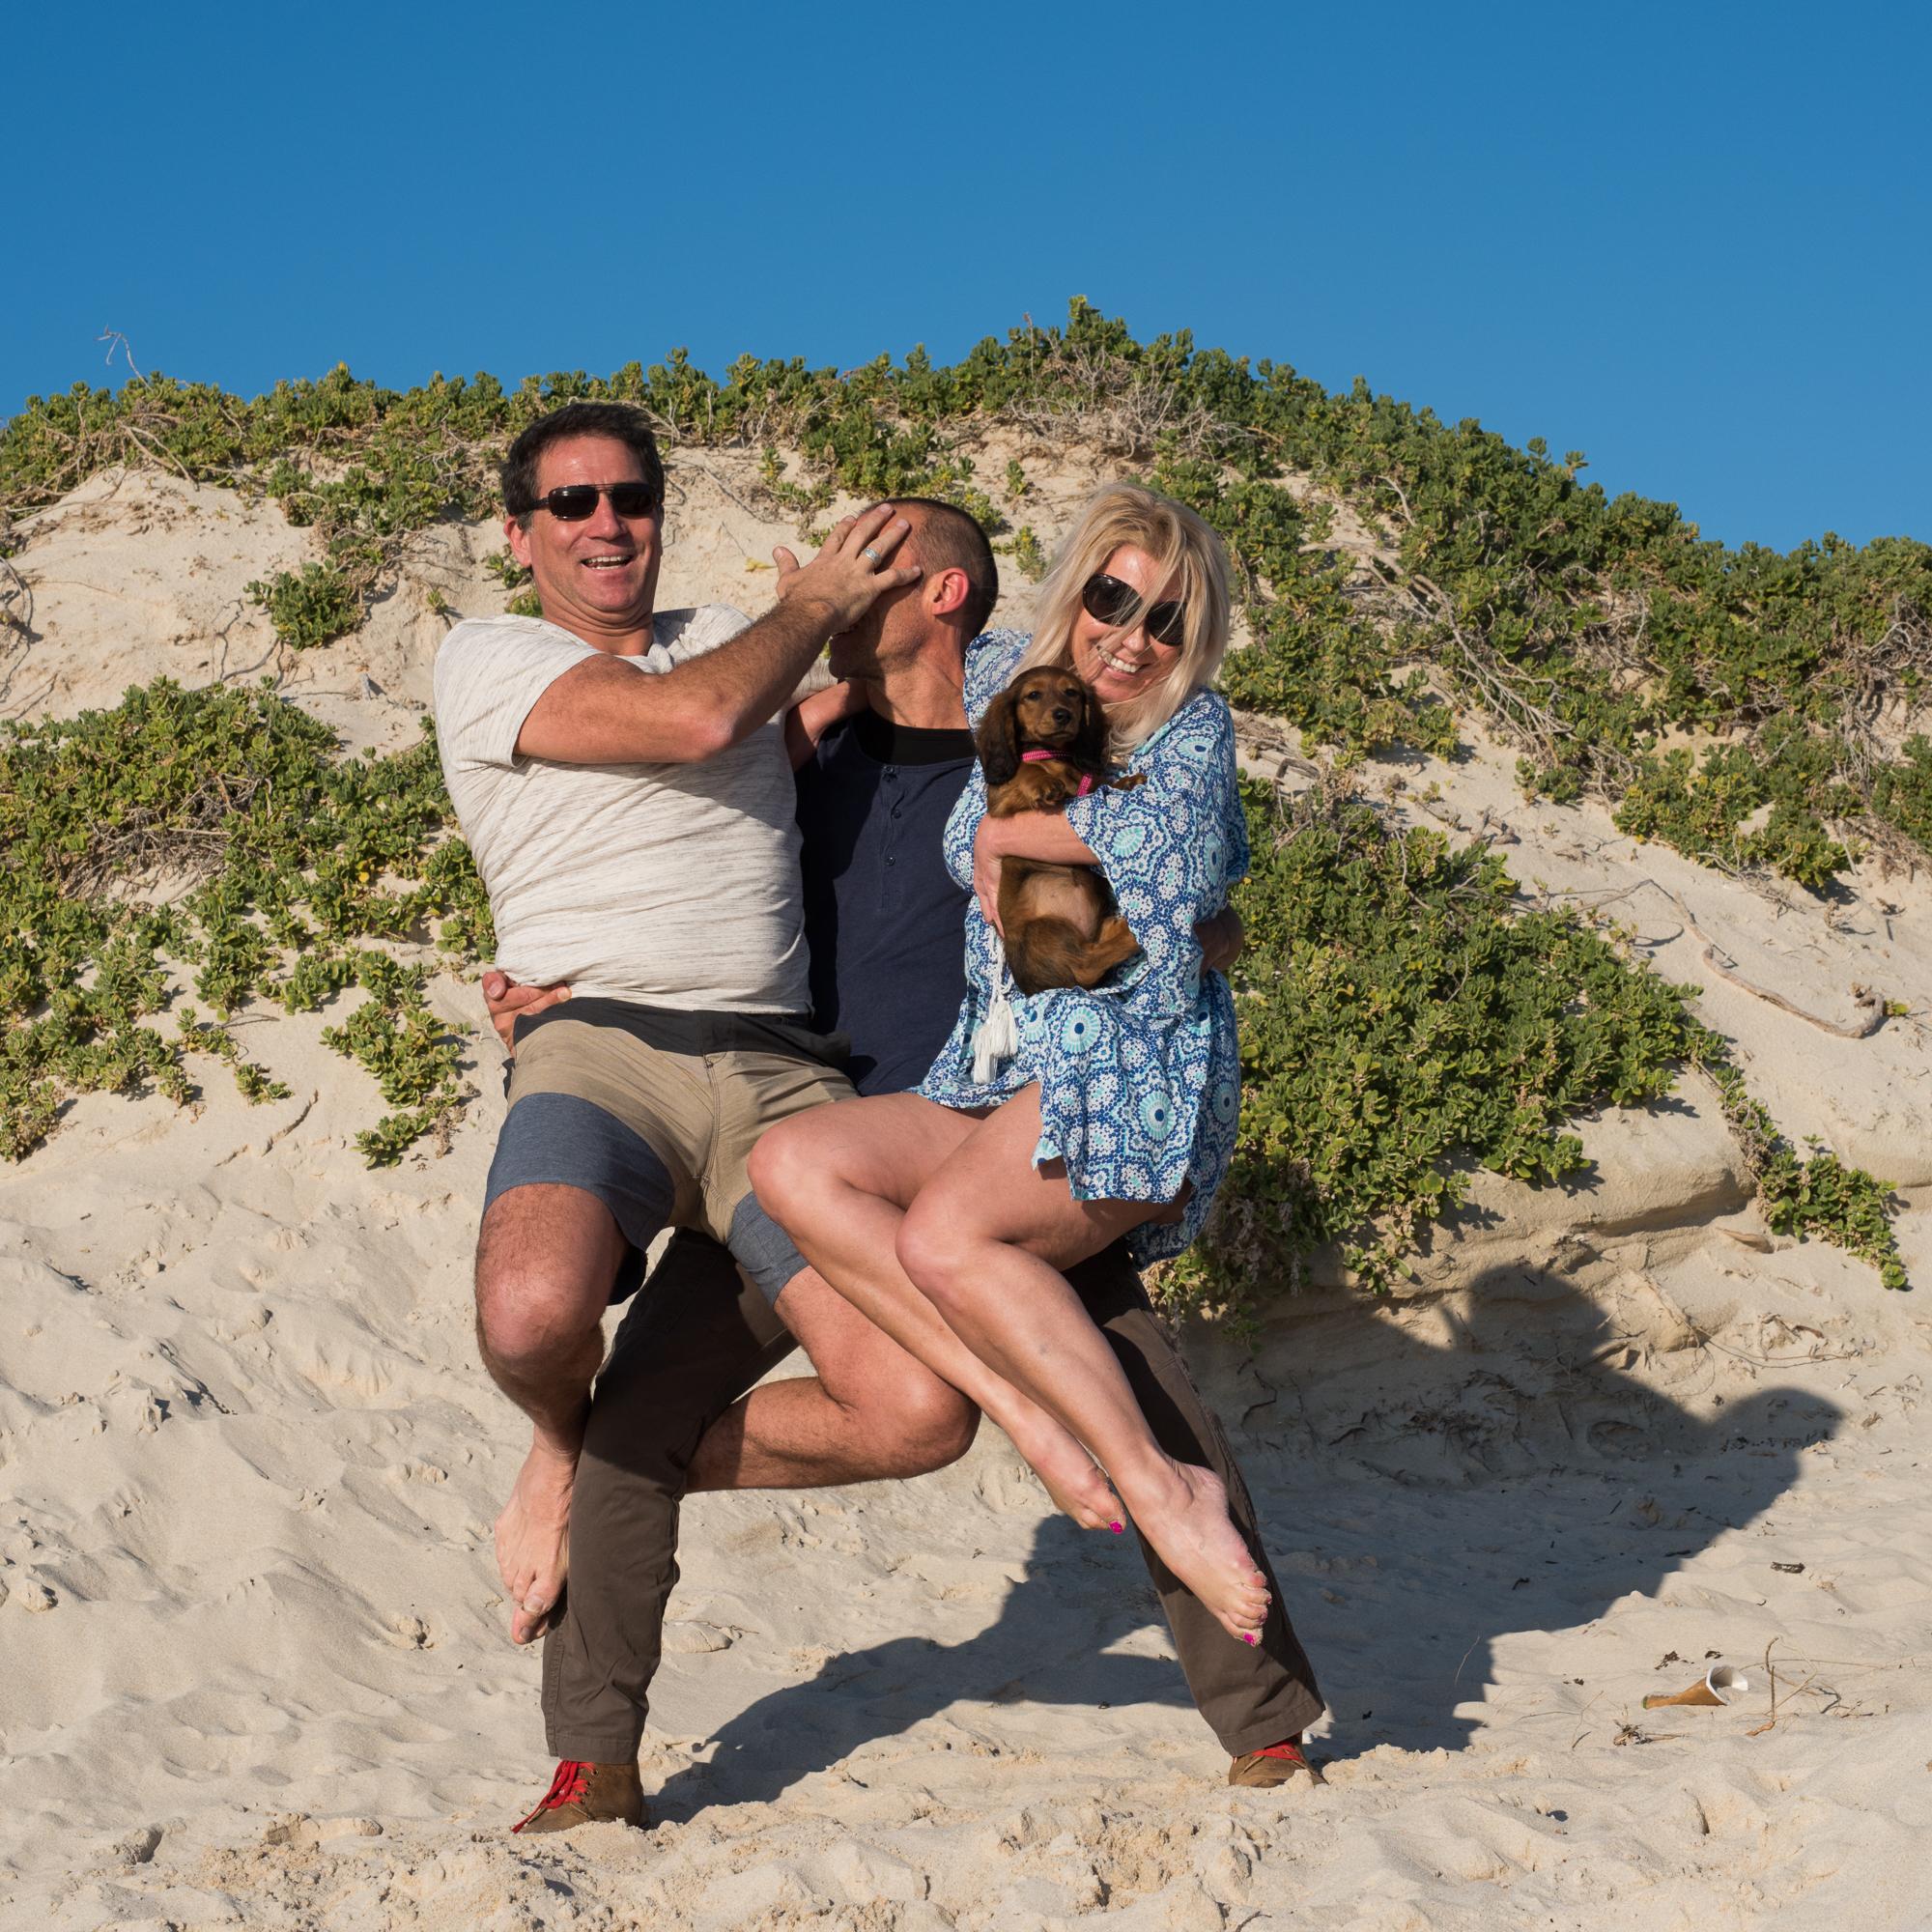 Dog Beach Perth - Dog and pony show